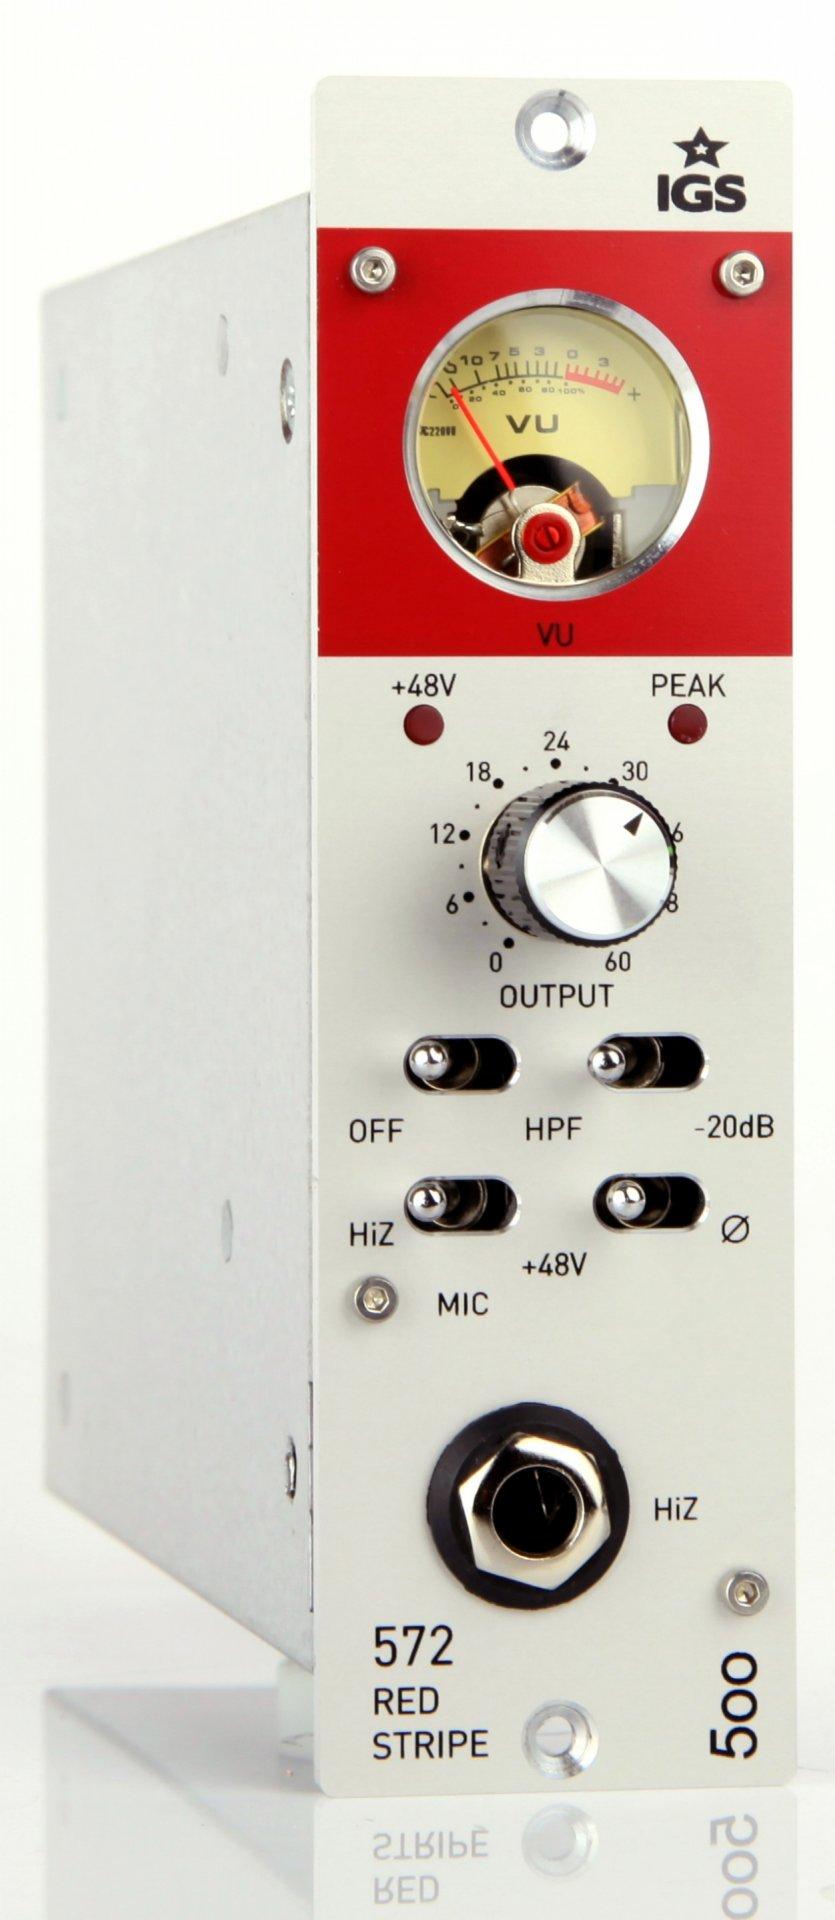 IGS 572 RED STRIPE